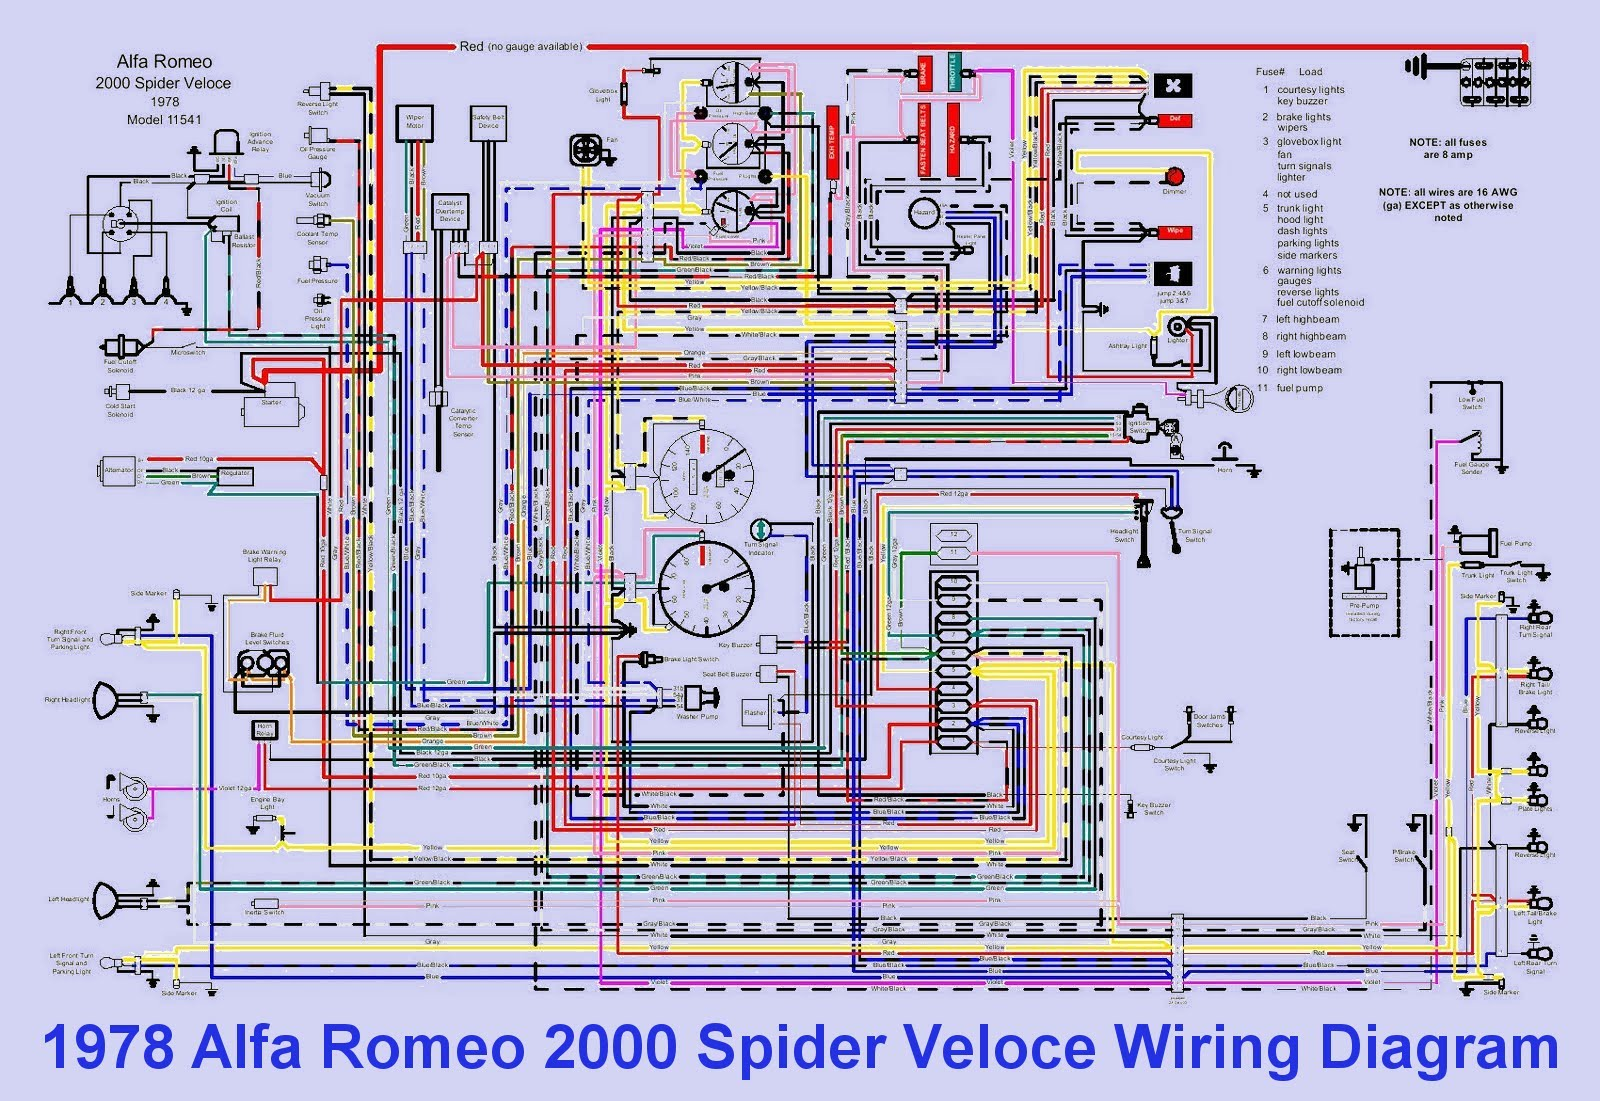 hight resolution of wiring diagram alfa romeo spider wiring diagram 1960 rolls royce wiring diagram 1960 rolls royce wiring diagram